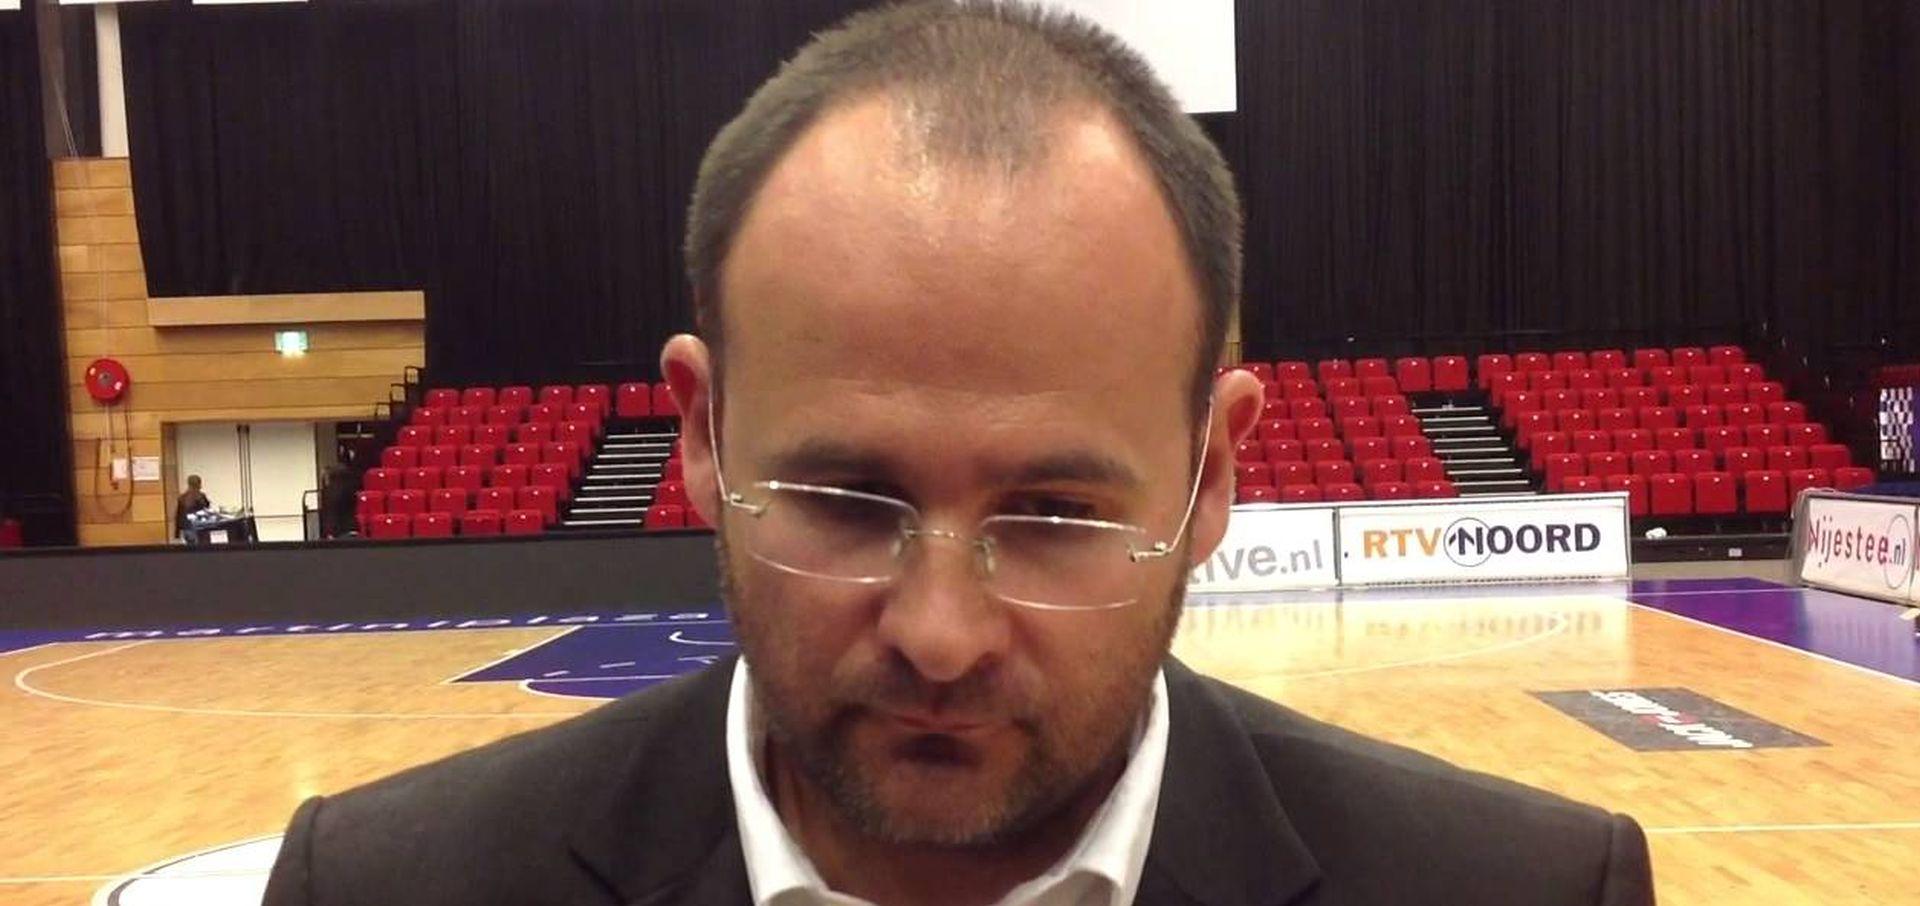 Izbornik Skelin objavio popis od 24 košarkaša za kvalifikacije za SP 2019.